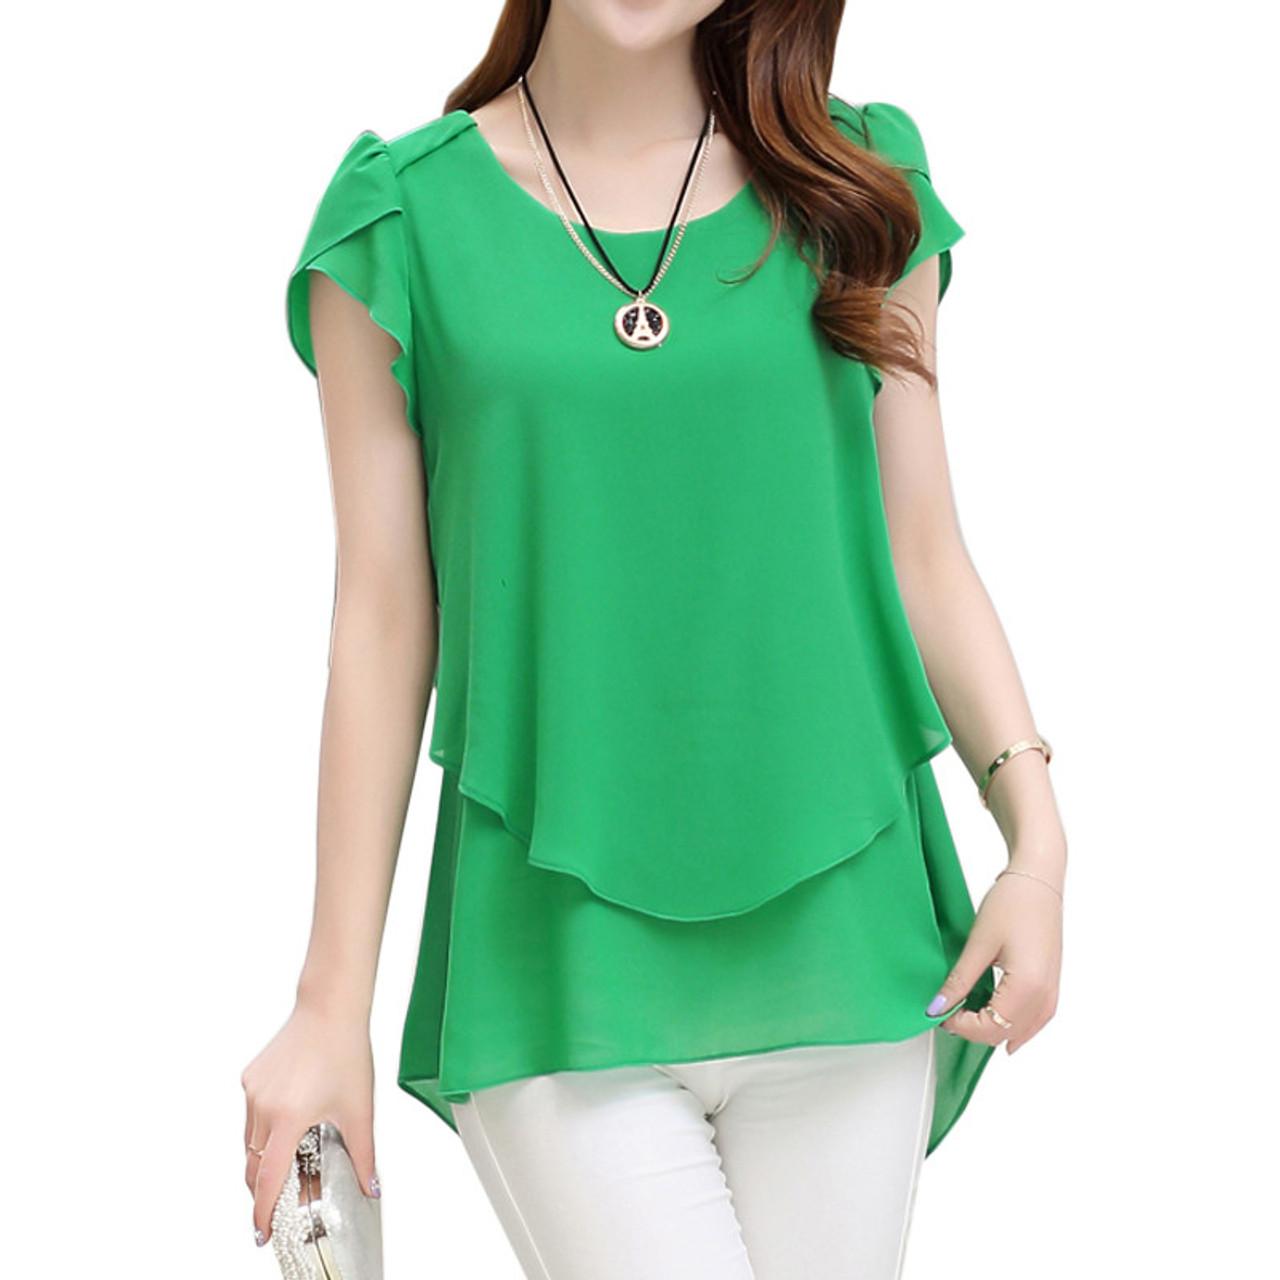 dc222c87a24 2017 Womens Short Sleeve Chiffon Blouse Peplum Summer Tops Ladies Long  Office Shirts Plus Size Ruffle ...